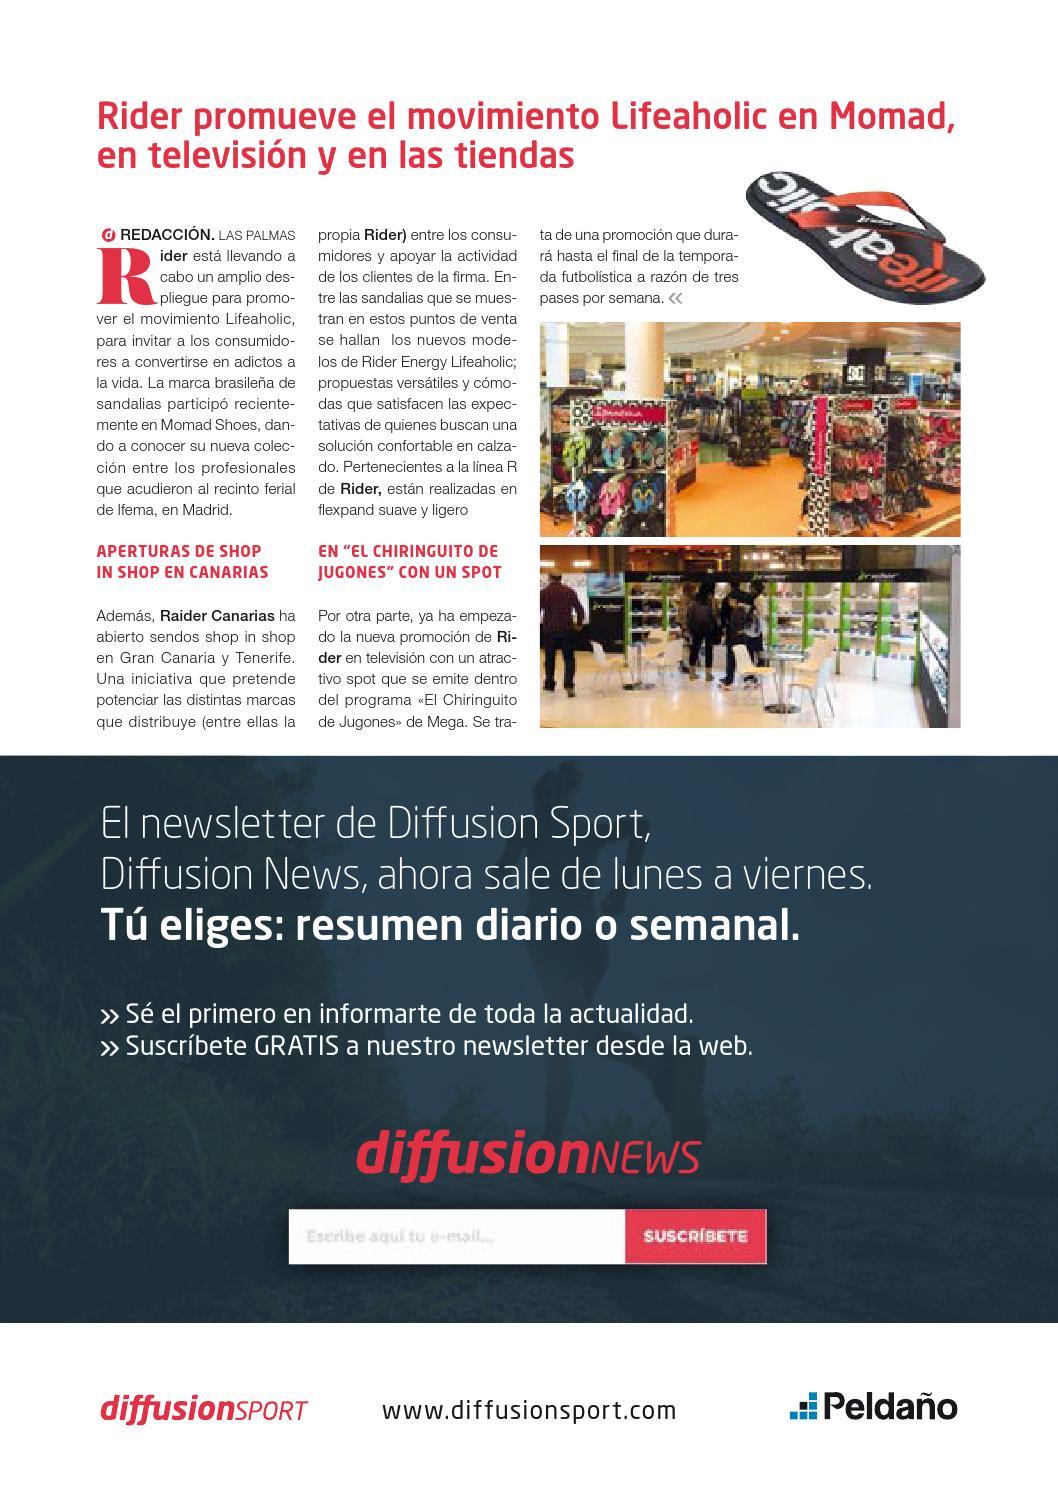 By Issuu Sport Peldaño 481 Diffusion K1TlF3Jc